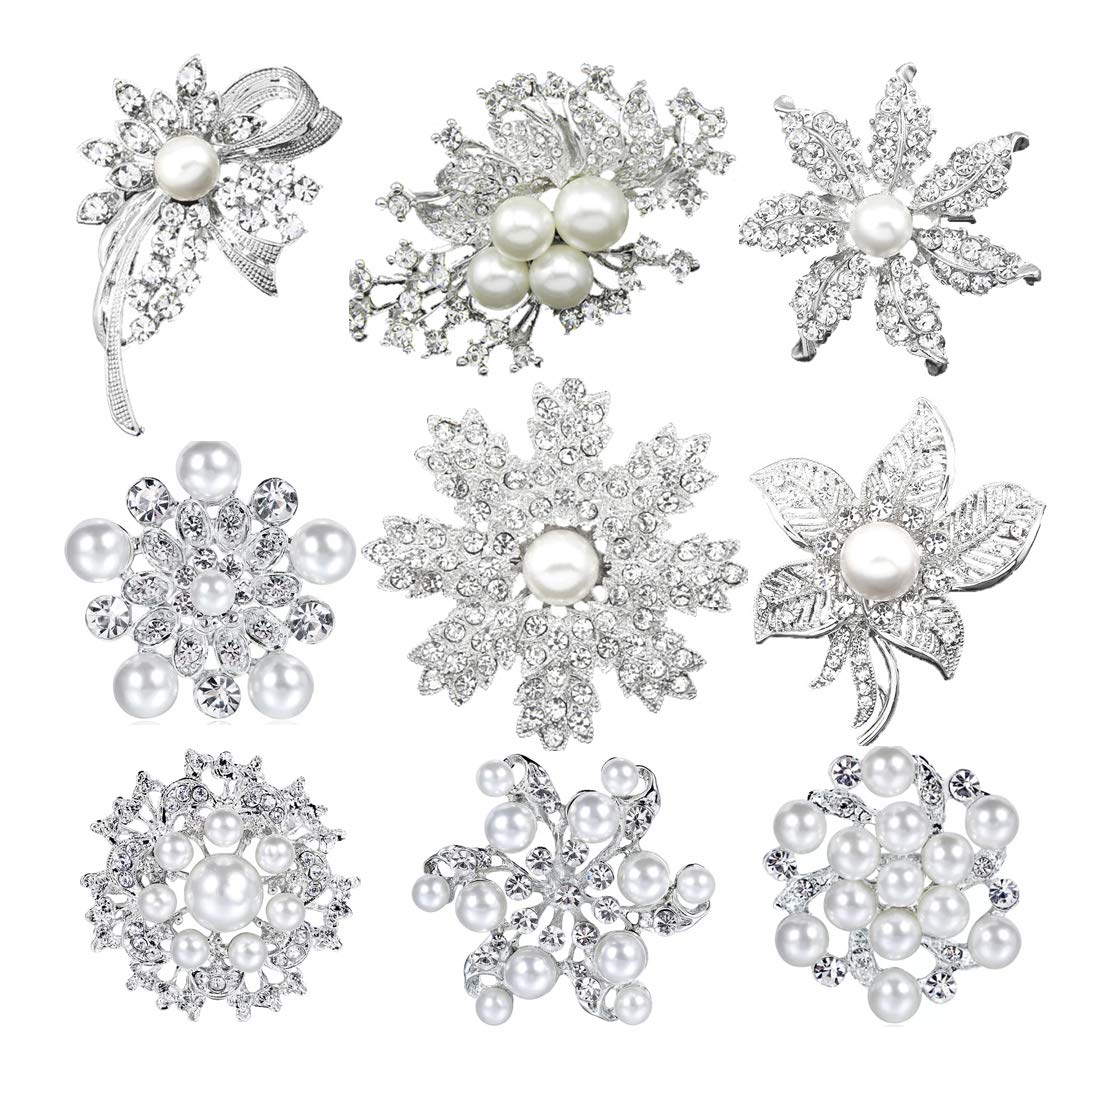 Mutian Fashion Lot 9pc Silver-Tone Faux Pearl Rhinestone Crystal Flower Brooches Pins by Mutian Fashion